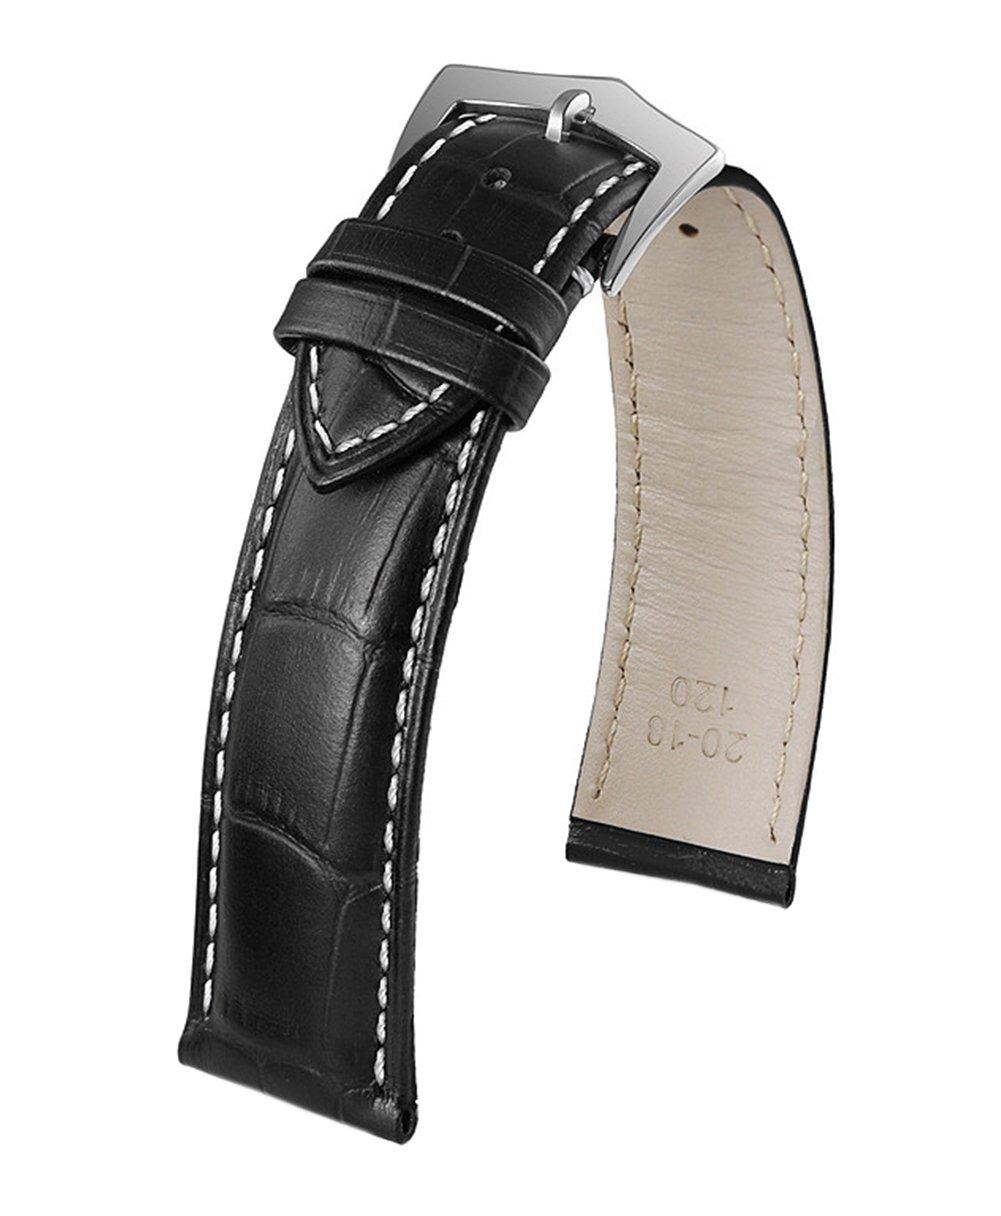 23mm Premium Mens Leather Wrist Strap In Black Contrasting White Stitch Crocodile Embossed Italian Calfskin Pin Buckle